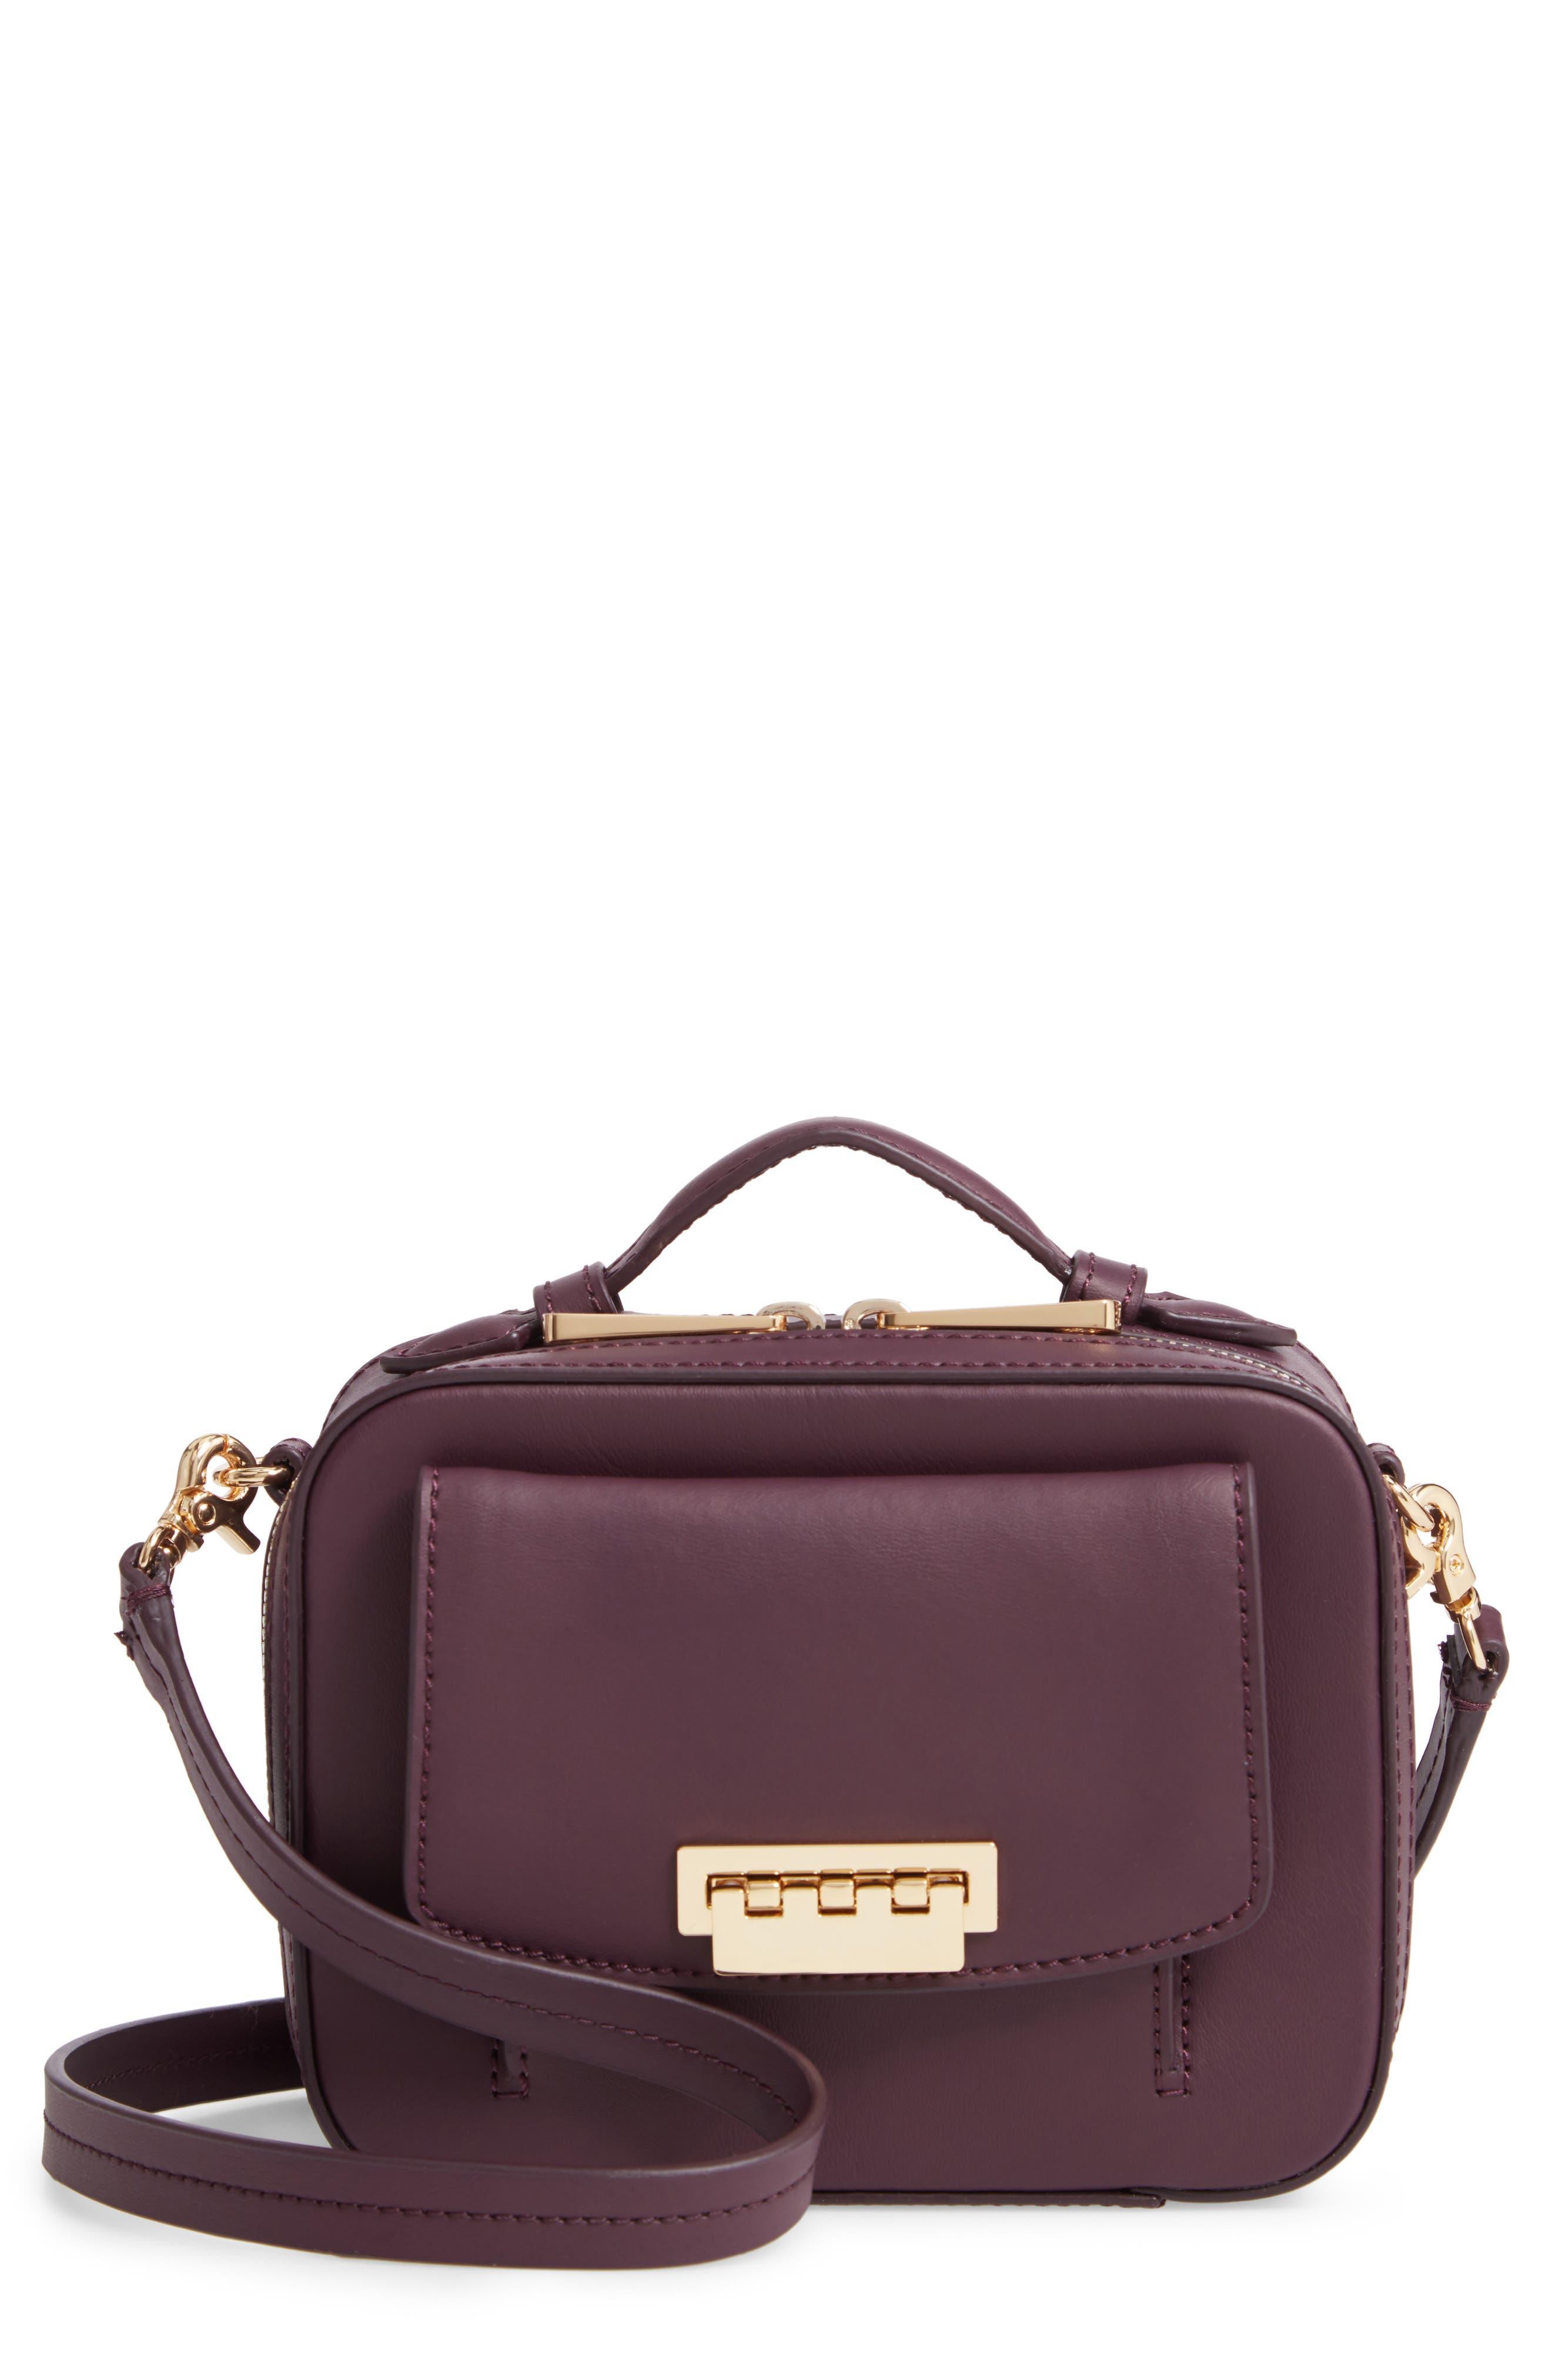 ZAC ZAC POSEN, Earthette Small Box Leather Crossbody Bag, Main thumbnail 1, color, 501